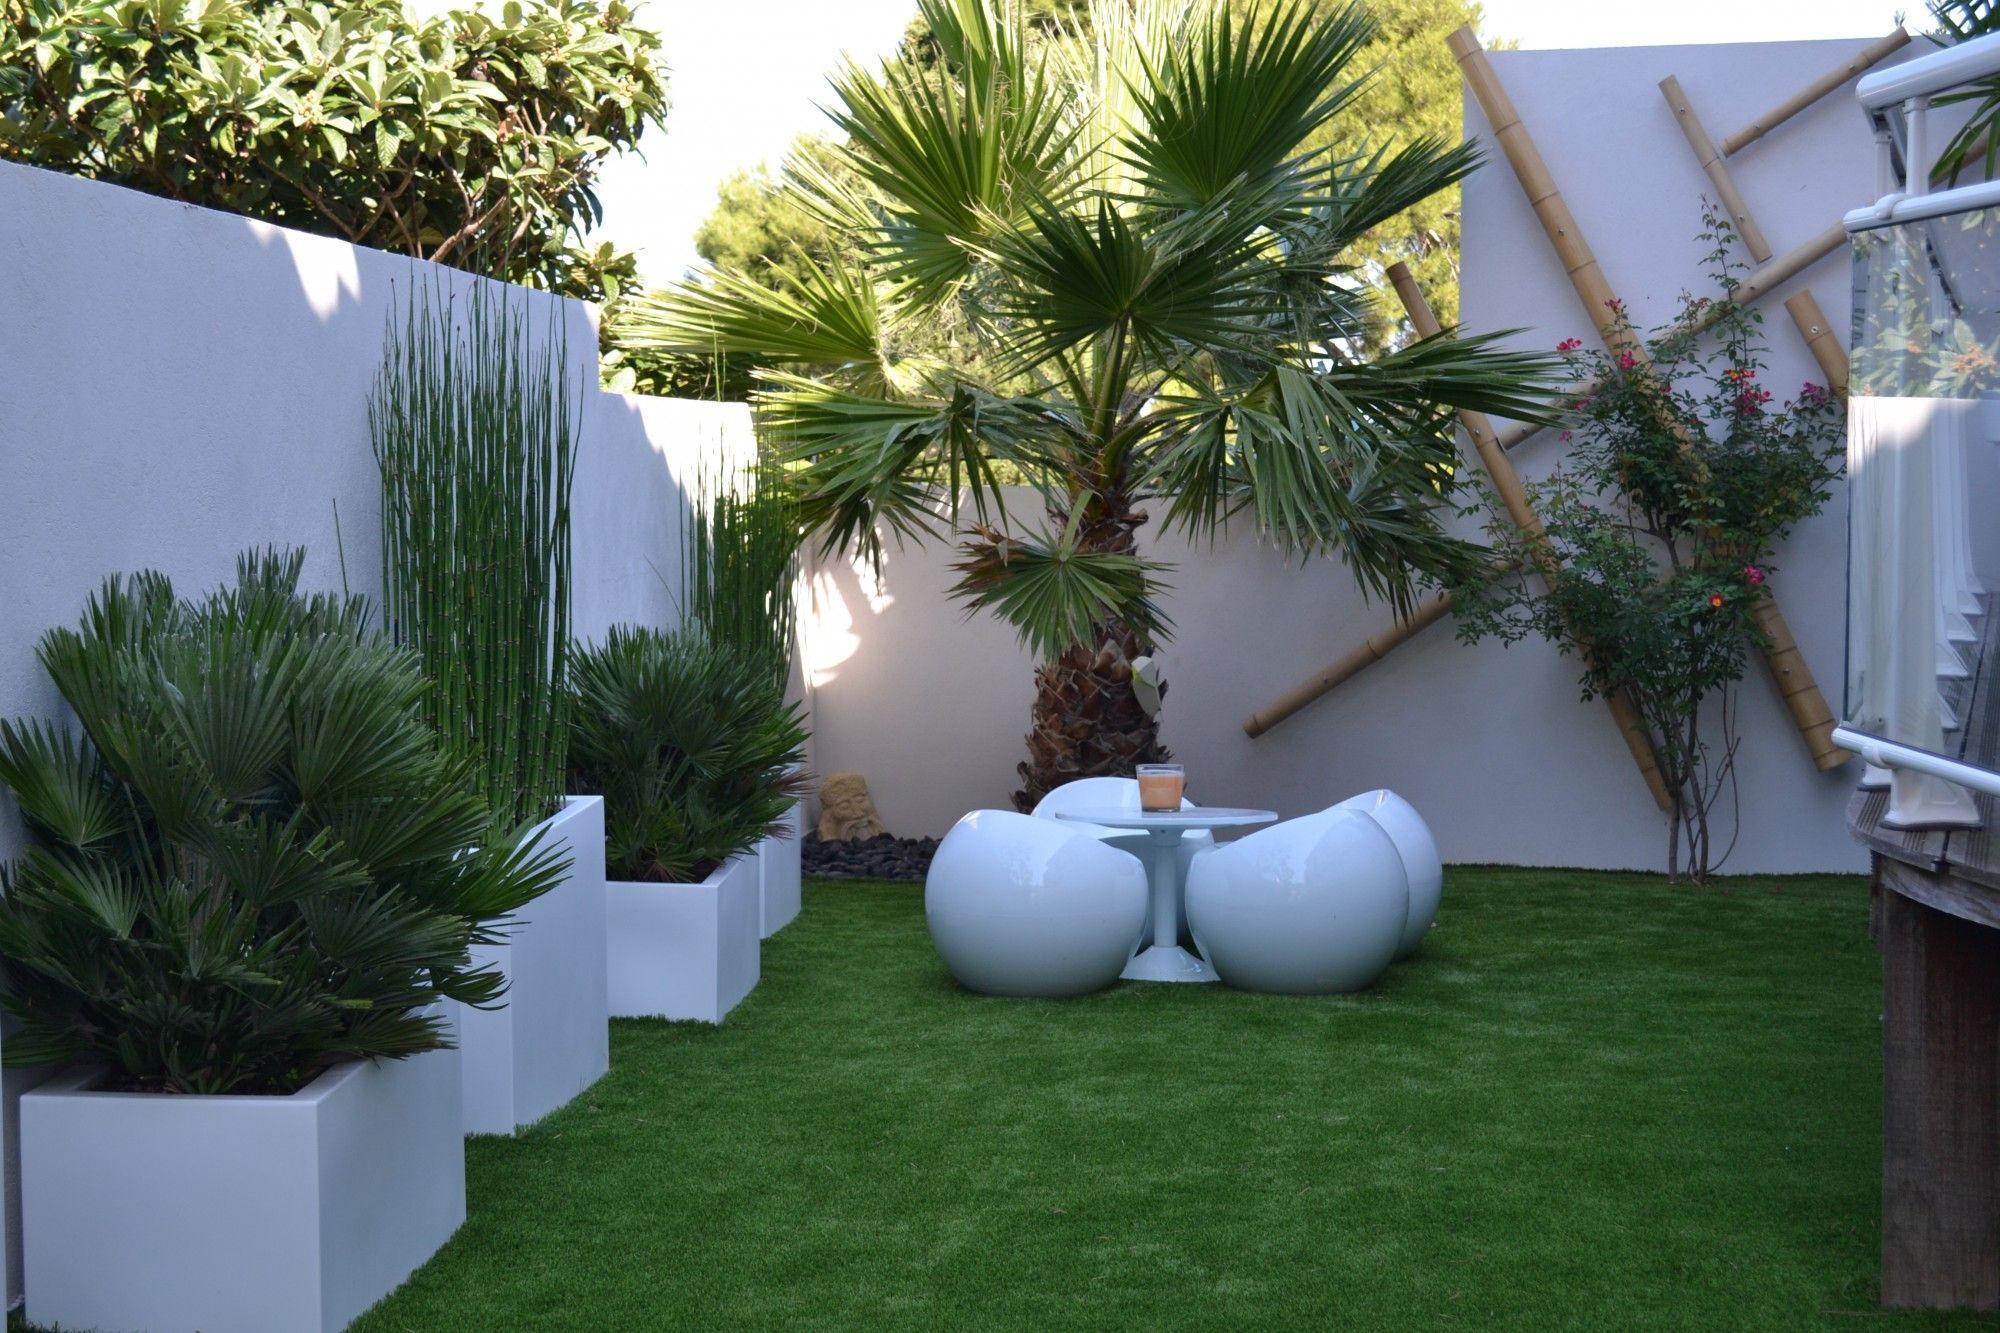 5572ca4744aab90c77b6d9222ea59758 Meilleur De De Idee Deco Jardin Conception